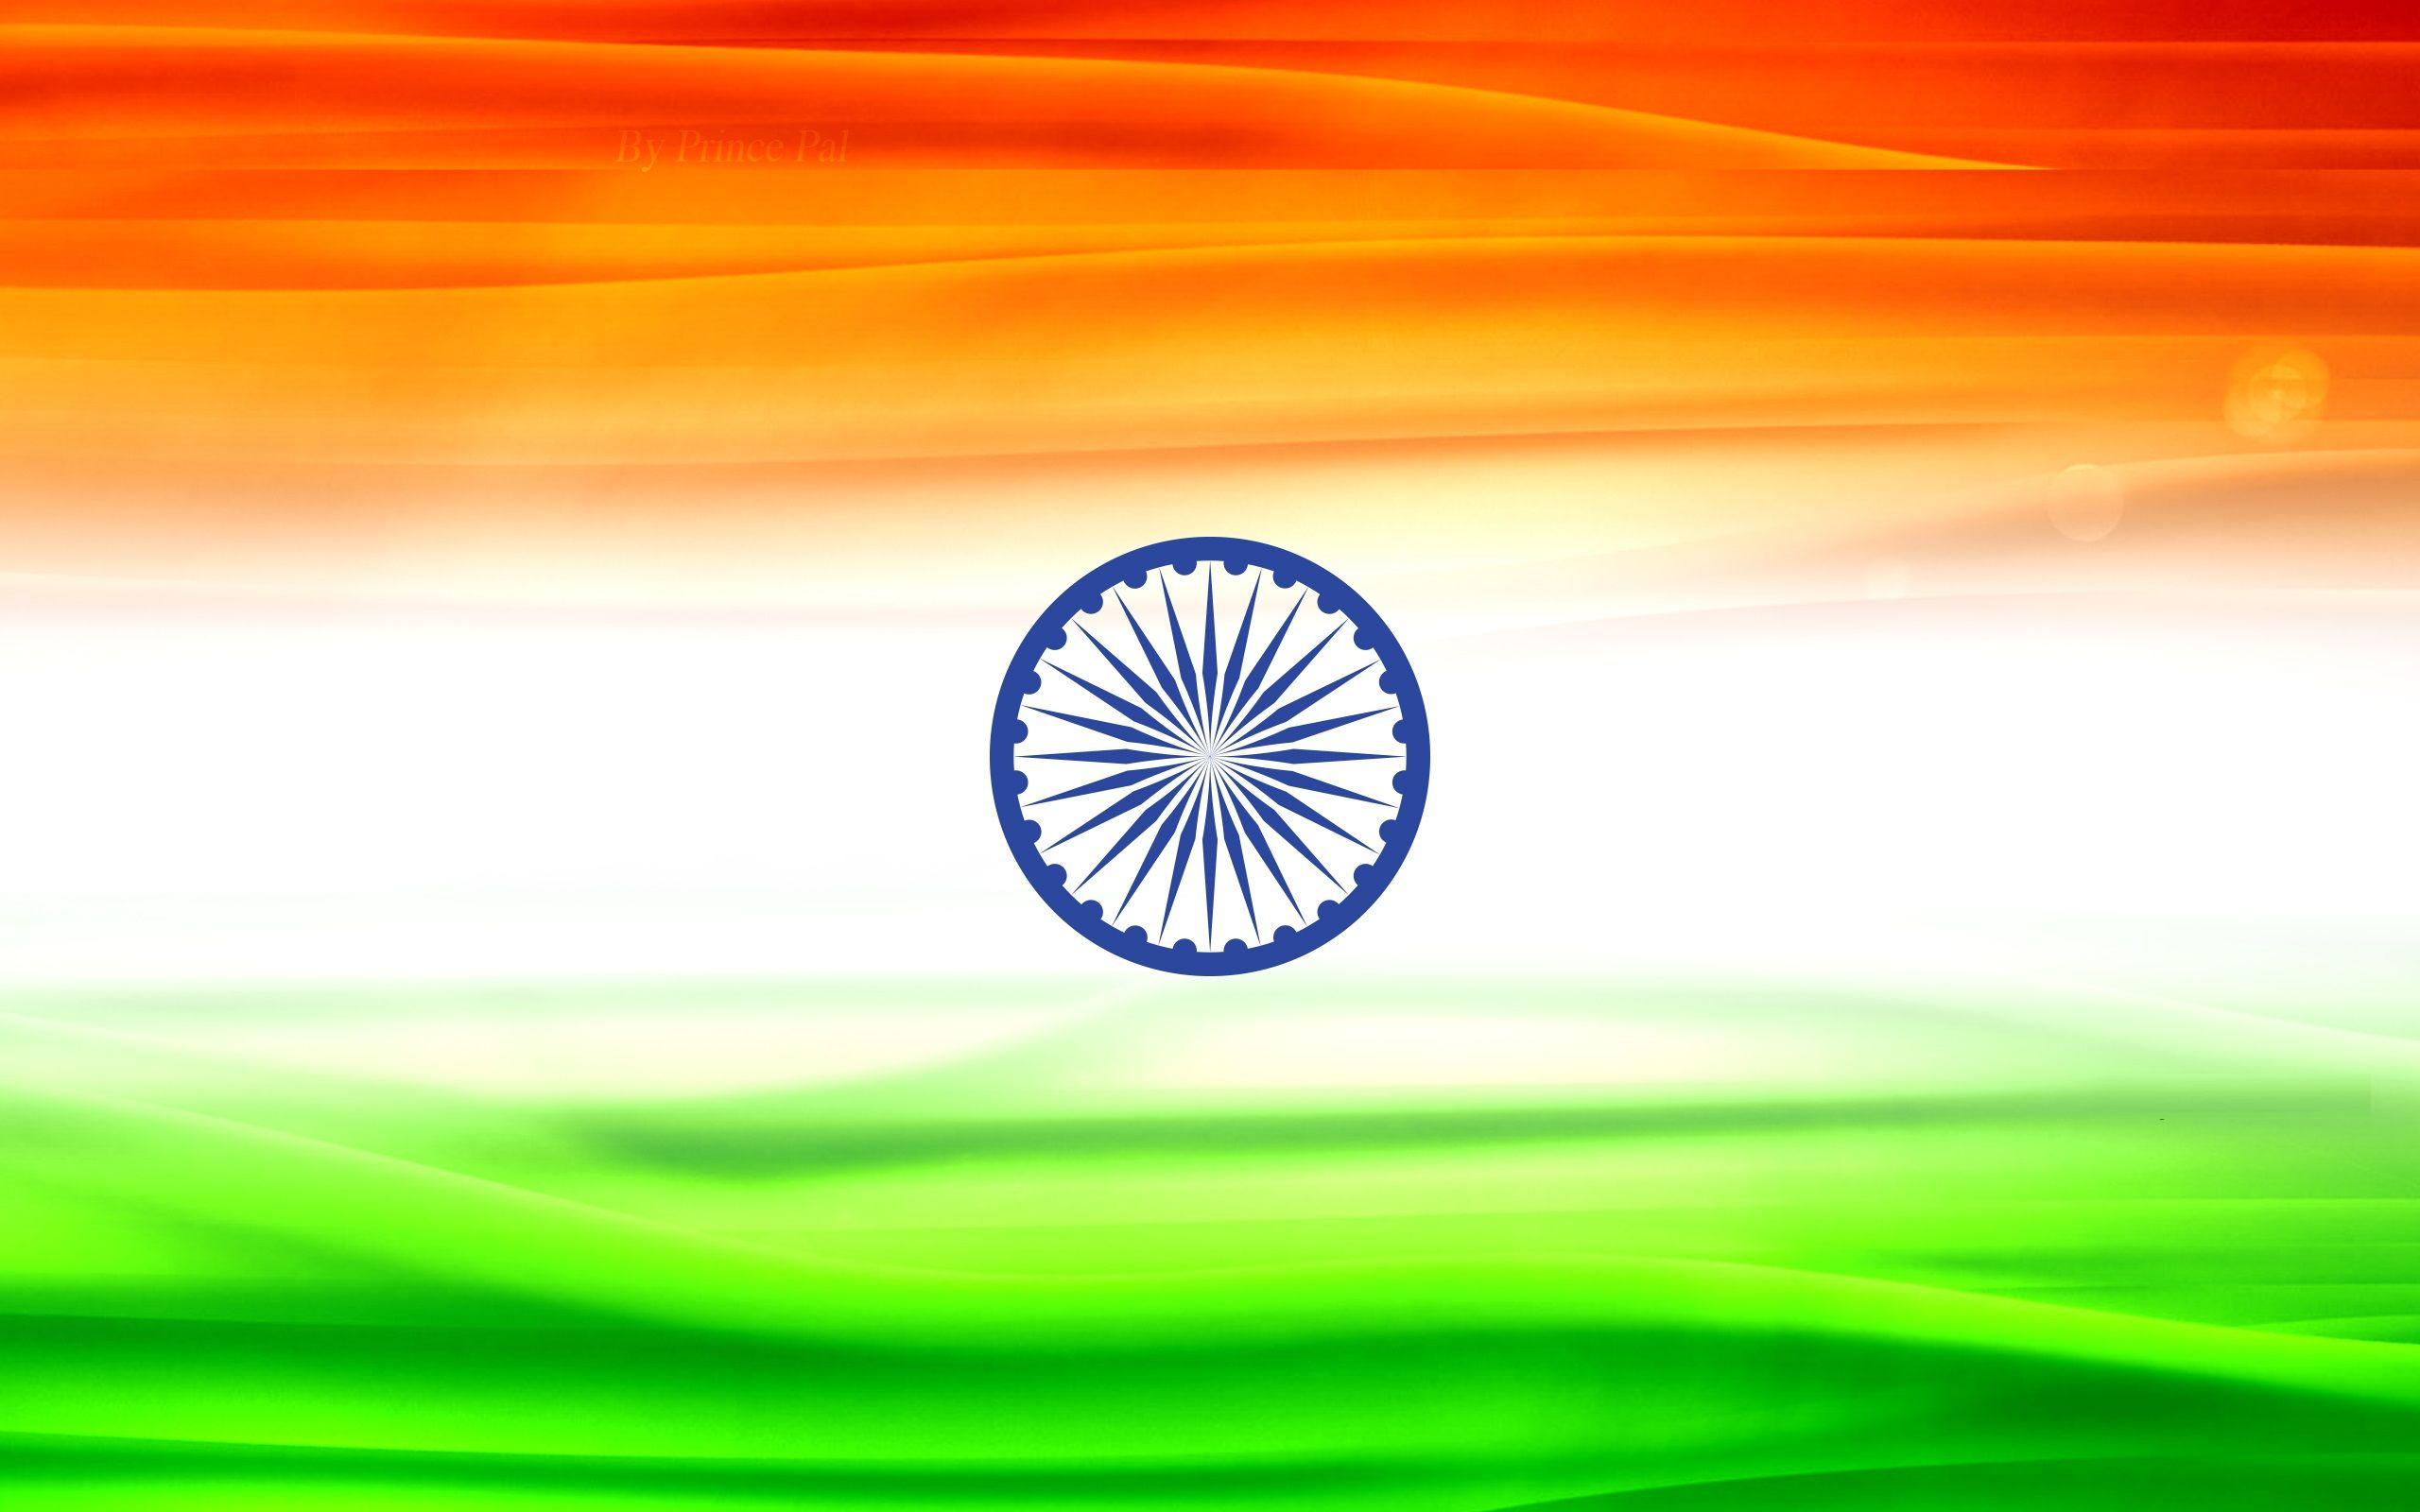 Indian Wallpaper Free Download